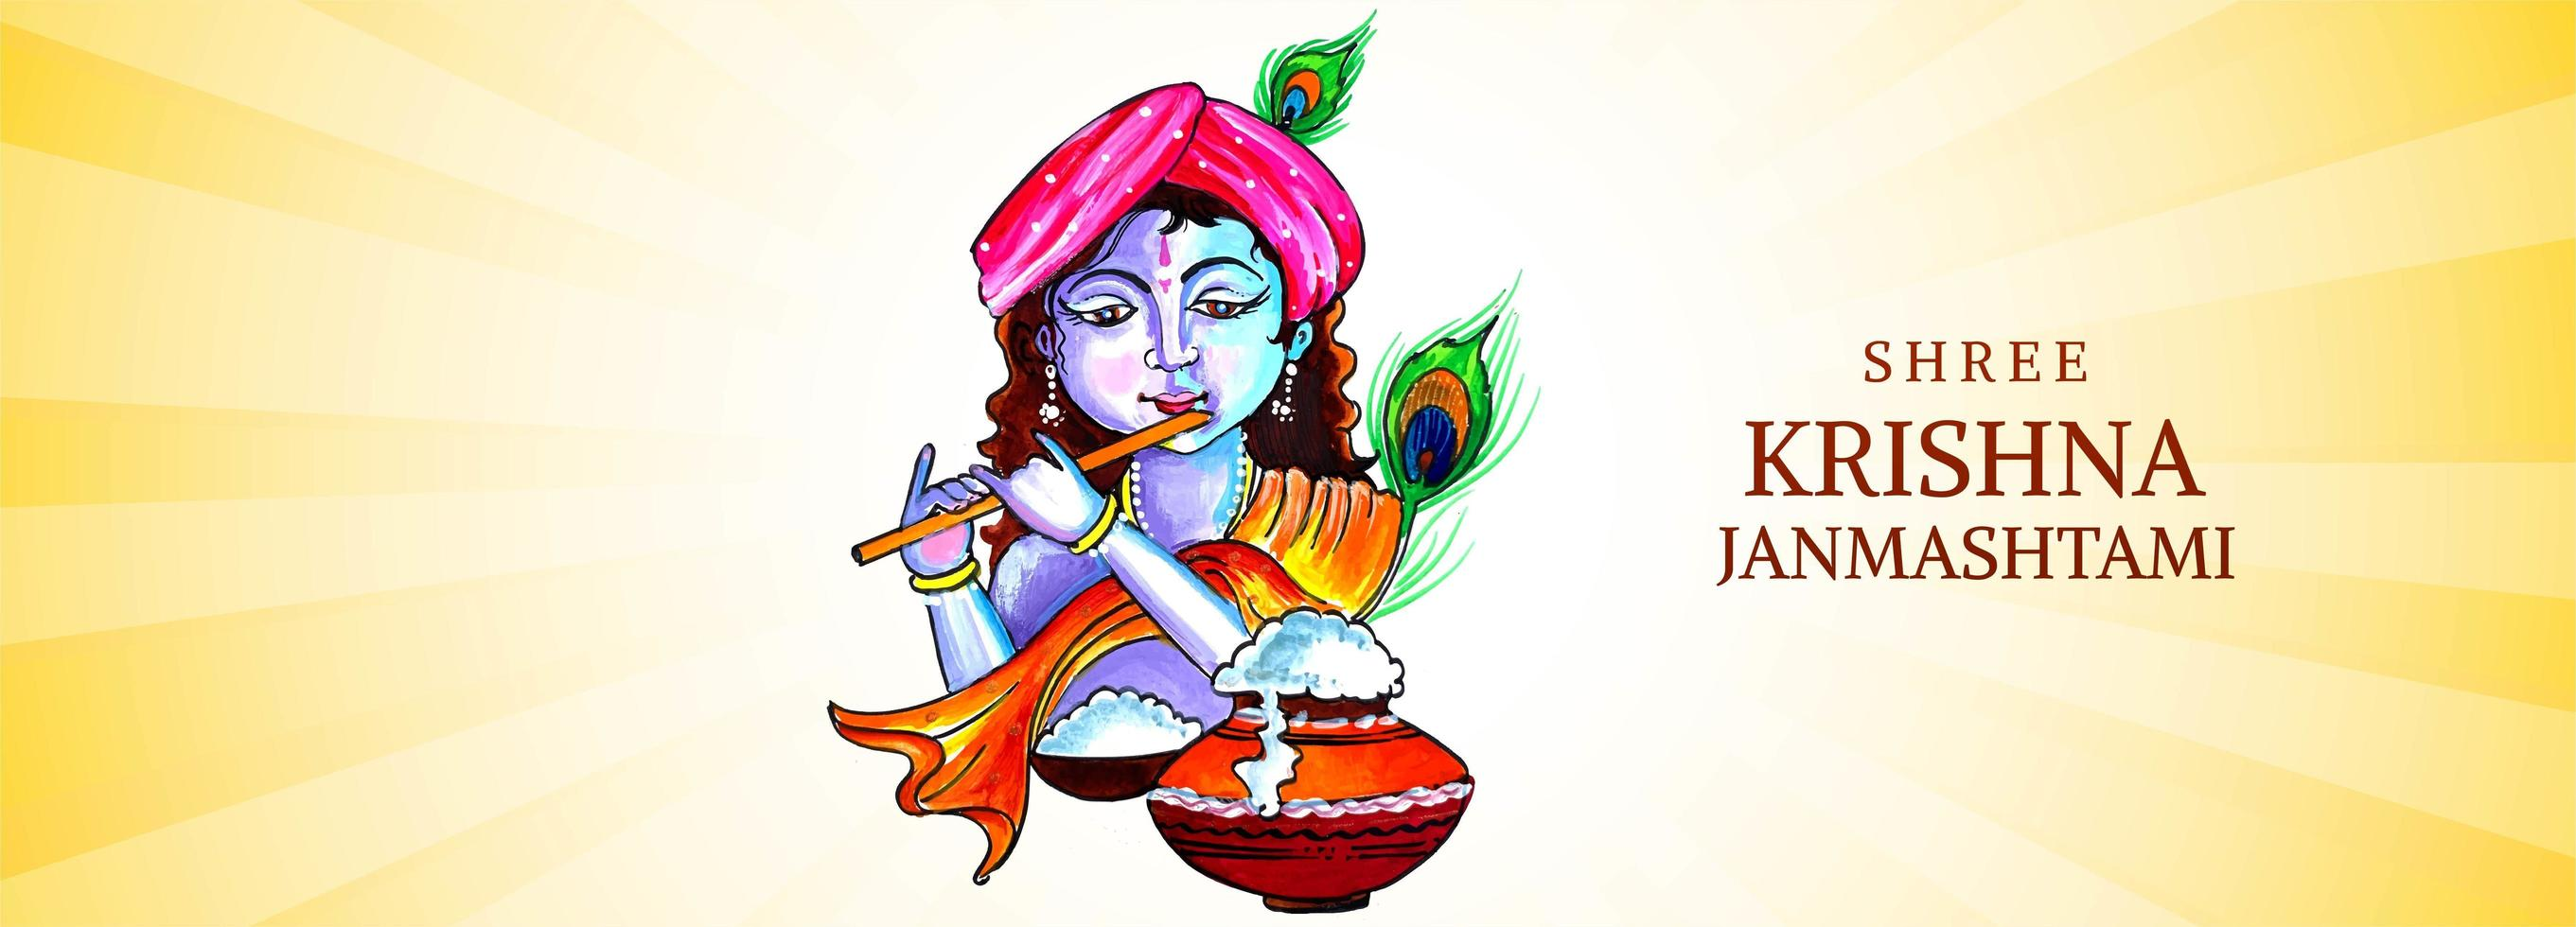 señor krishna tocando la flauta con fajín naranja janmashtami diseño de banner vector